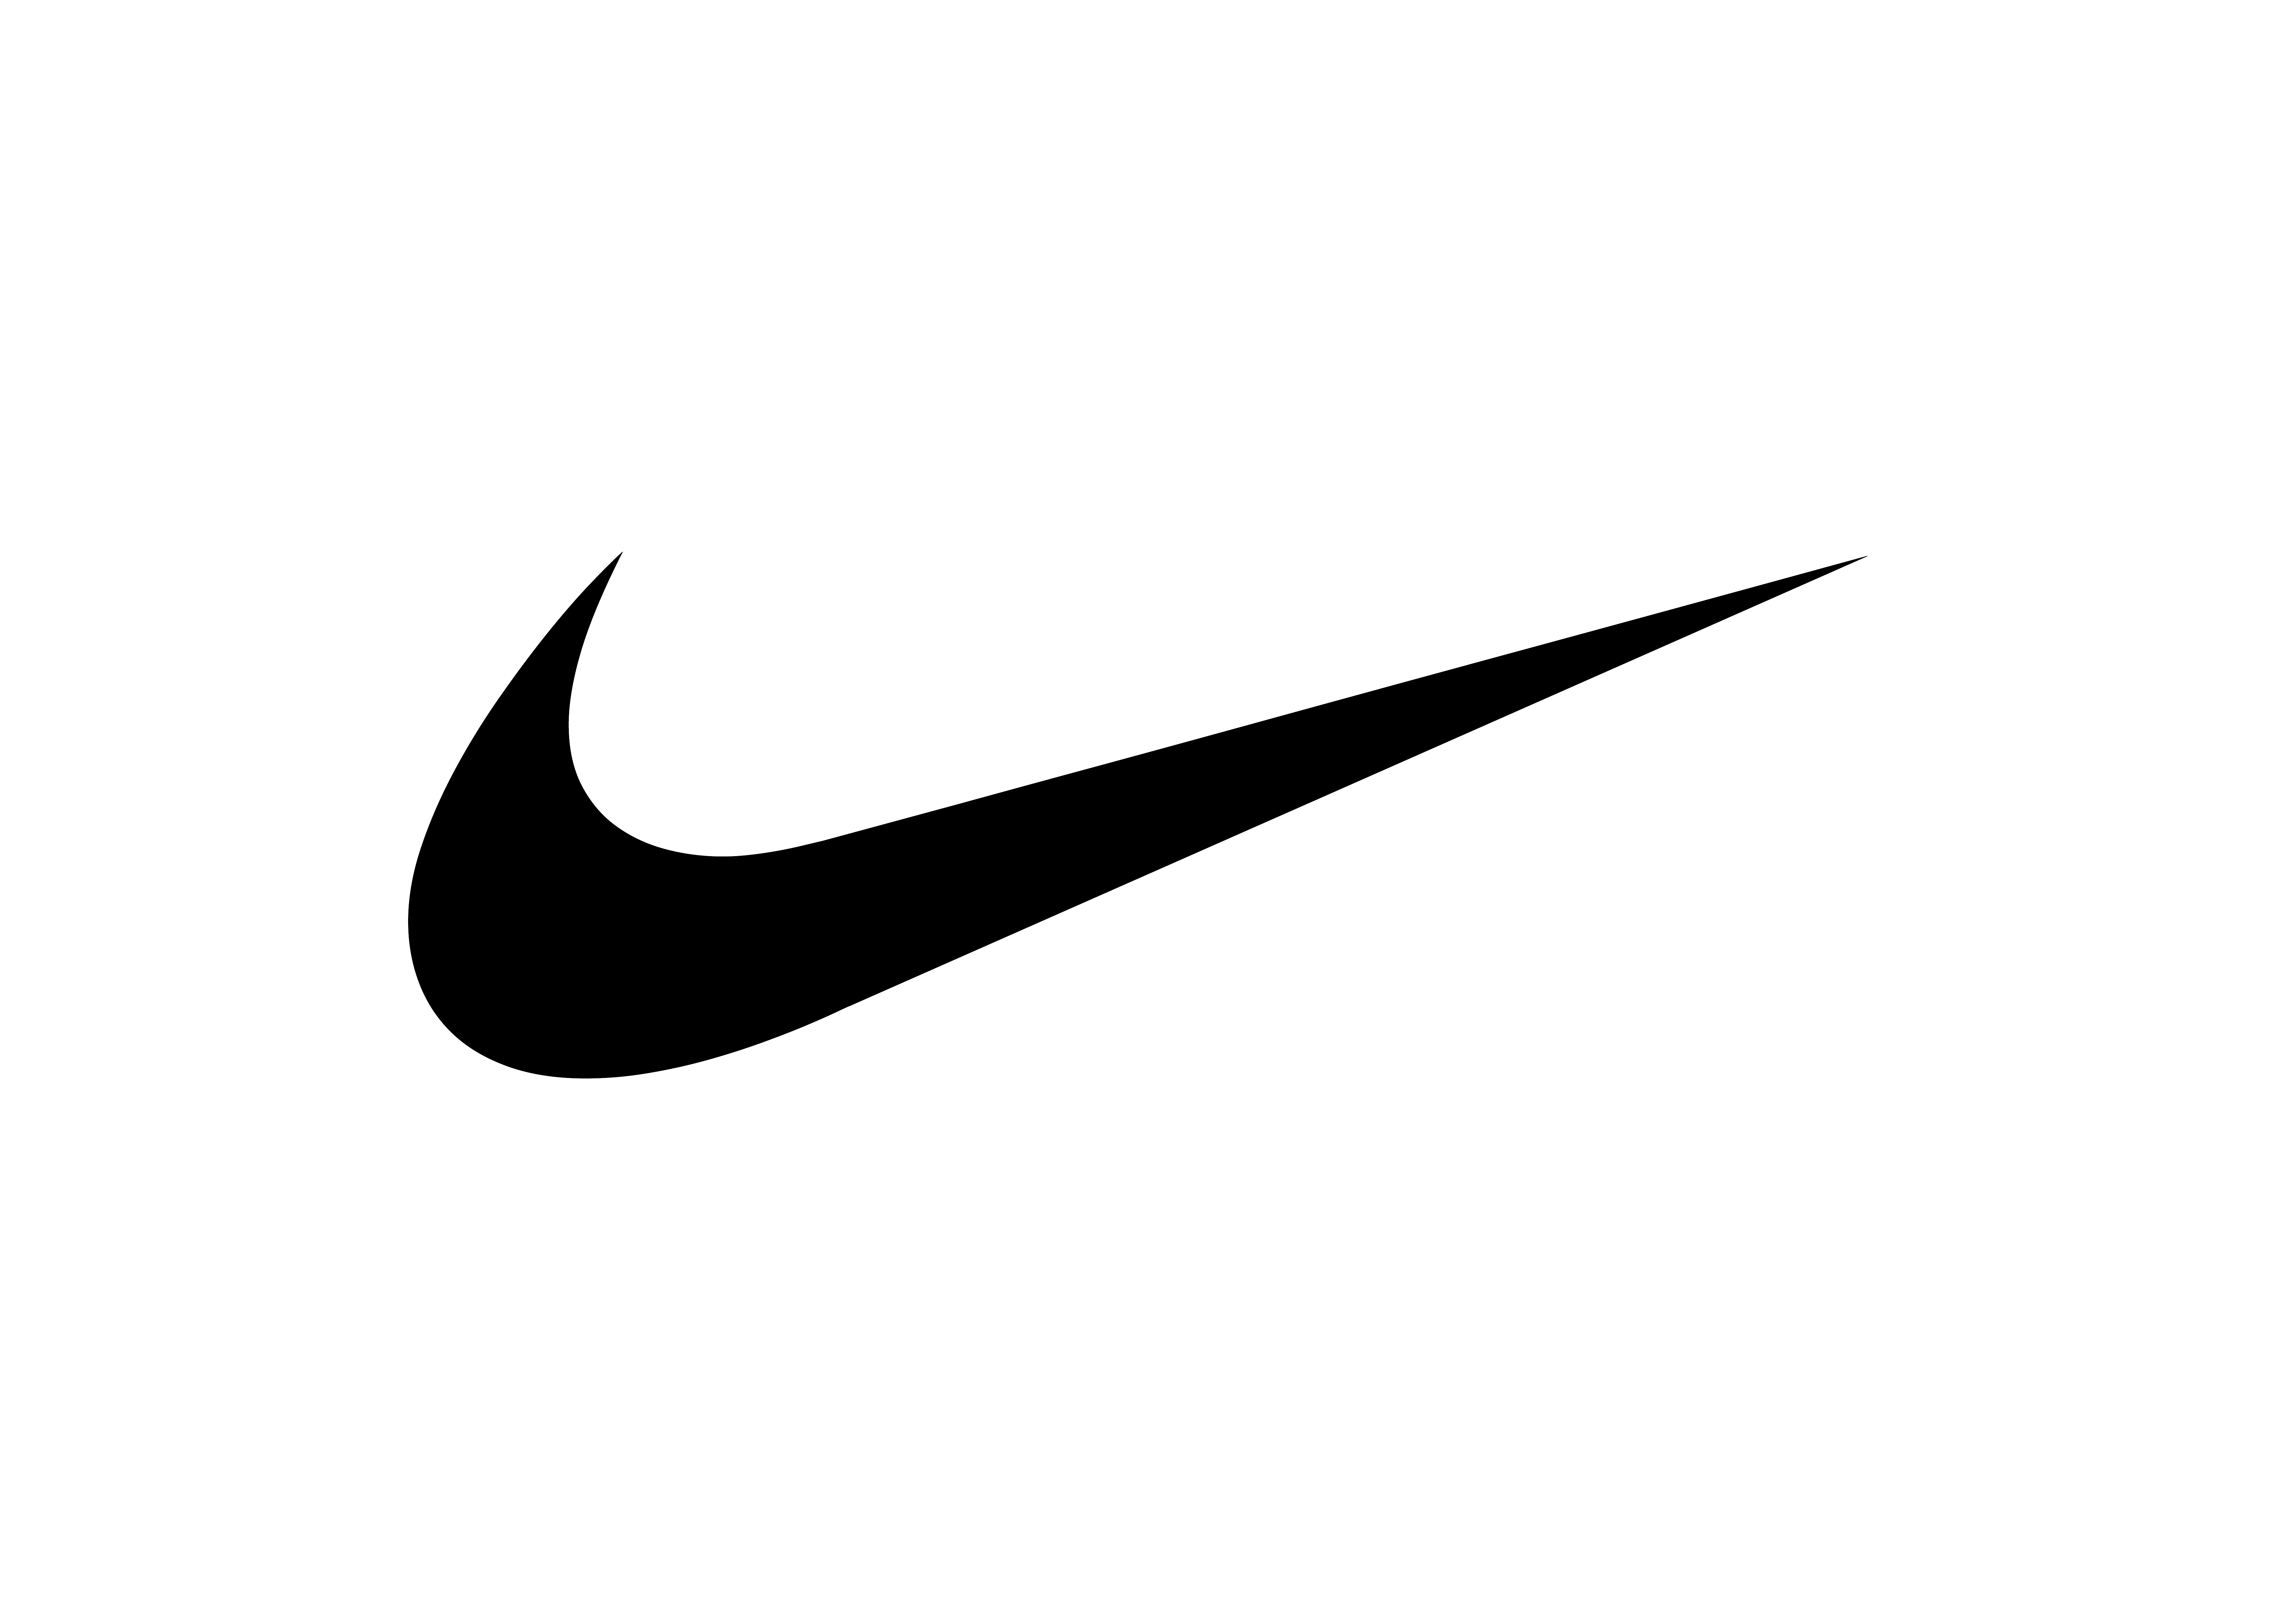 NIKE Freeknit+ – UID'16, June 3-4, Umeå Institute of Design - Nike Logo Design